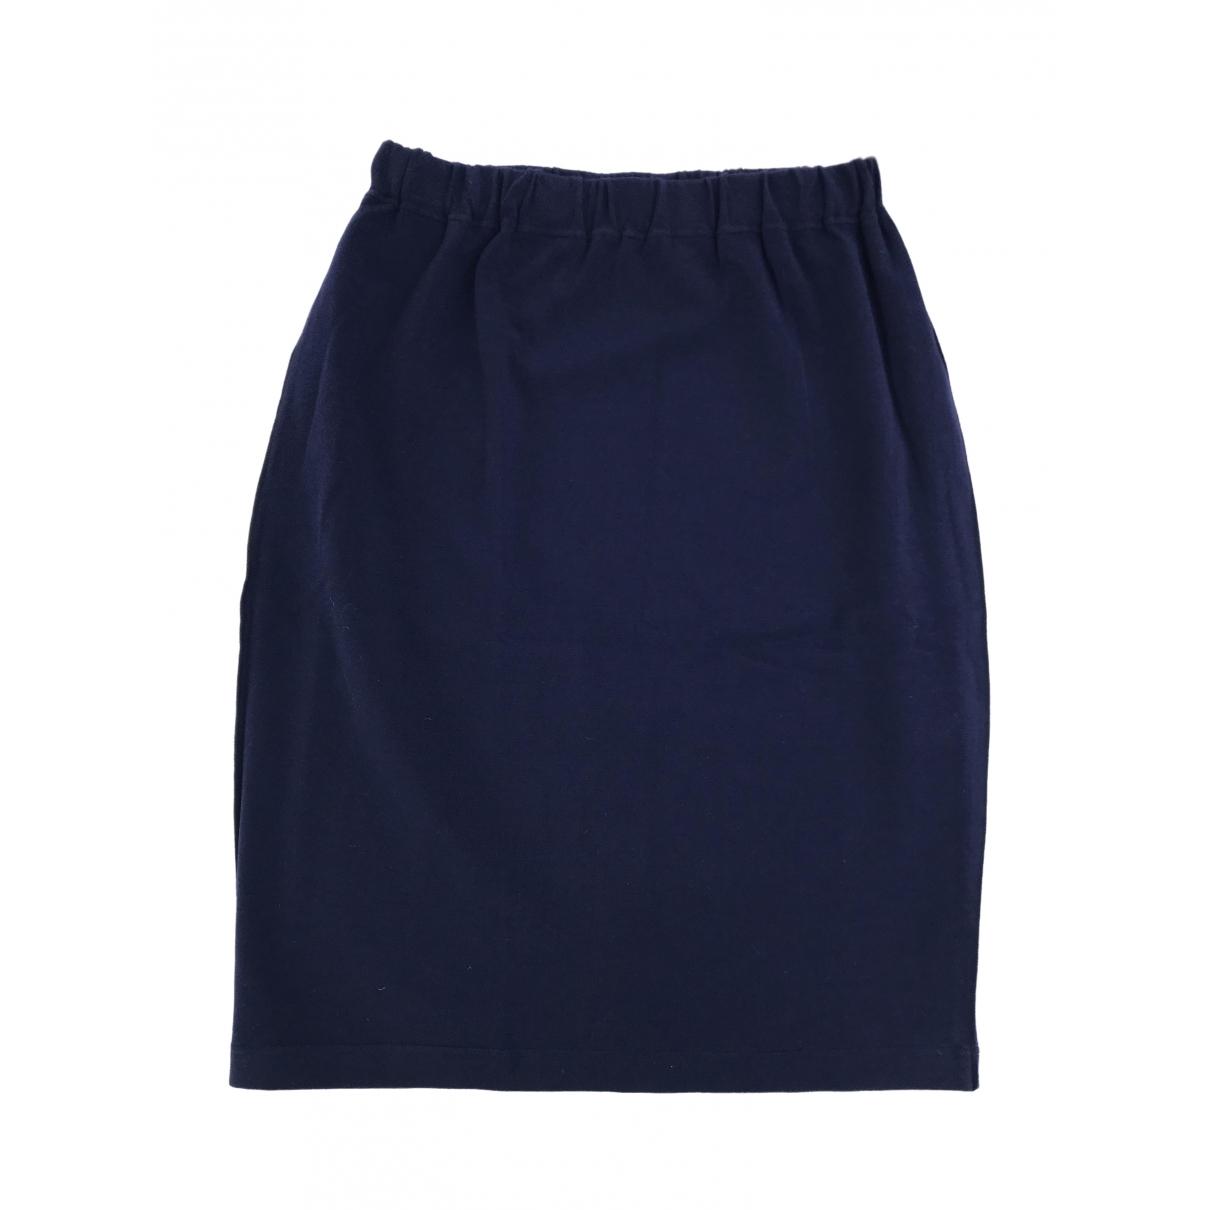 Sonia Rykiel - Jupe   pour femme en coton - bleu